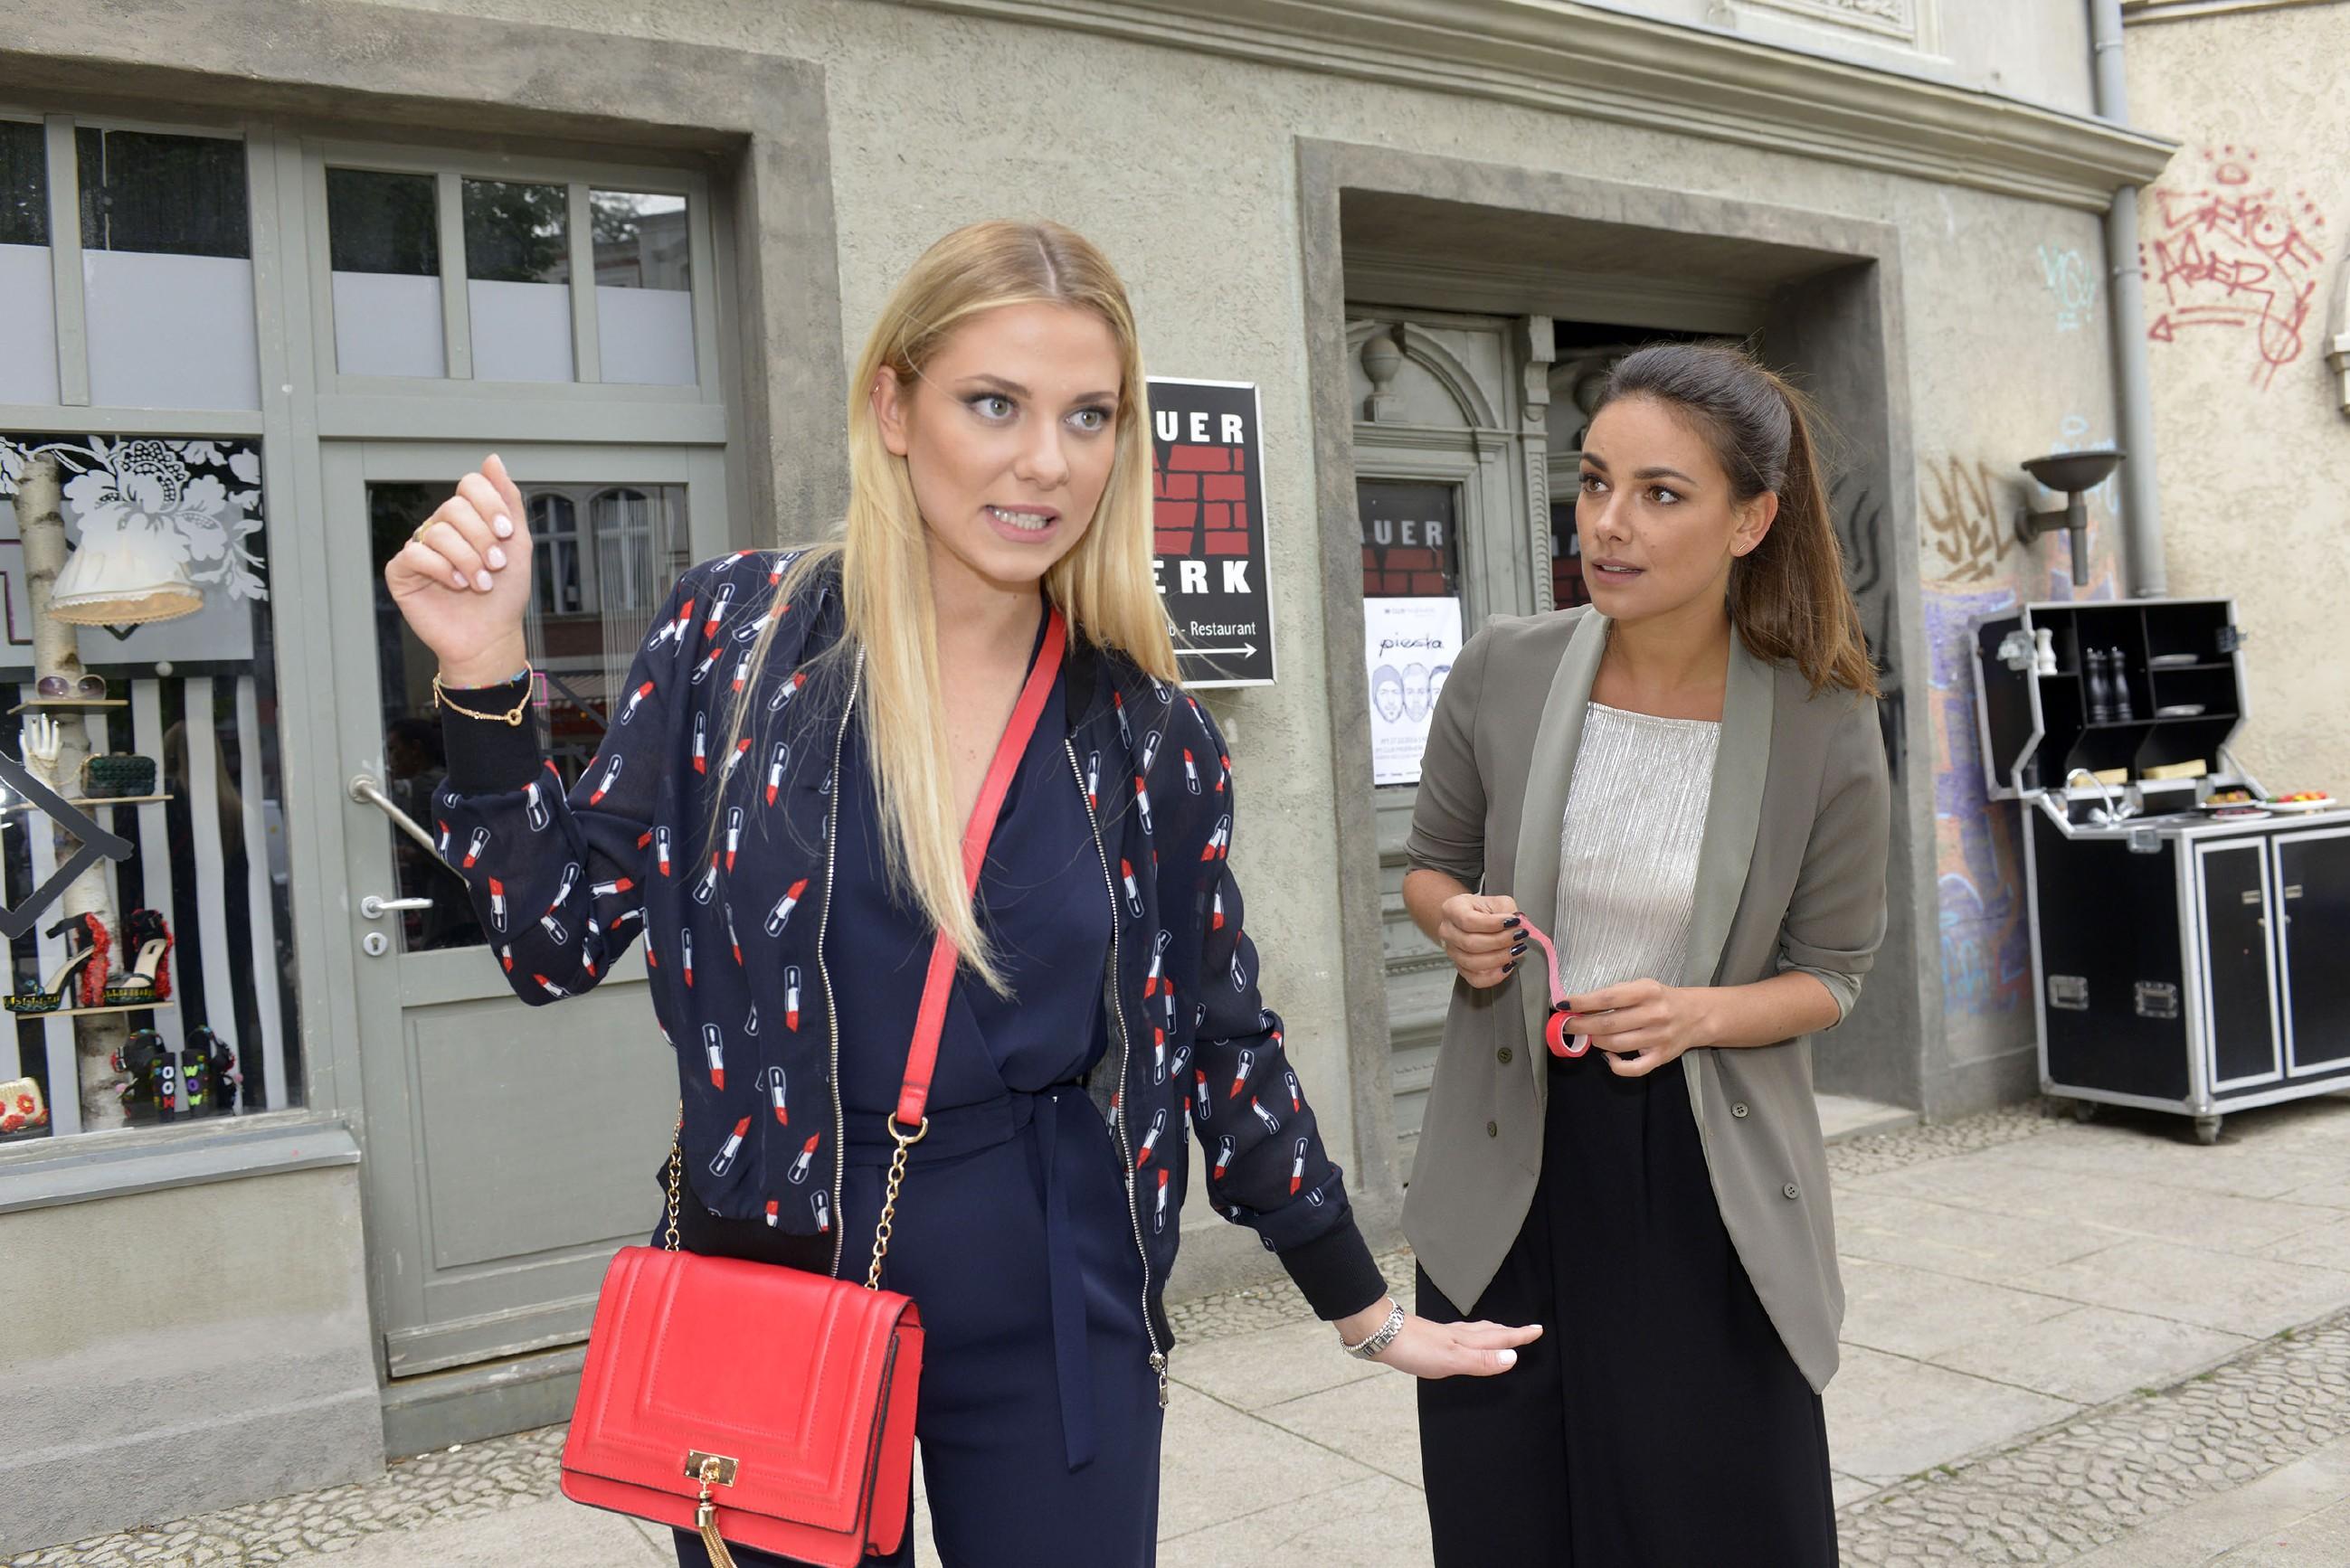 Jasmin (Janina Uhse, r.) fragt sich, warum Sunny (Valentina Pahde) so nervös ist. (Quelle: RTL / Rolf Baumgartner)